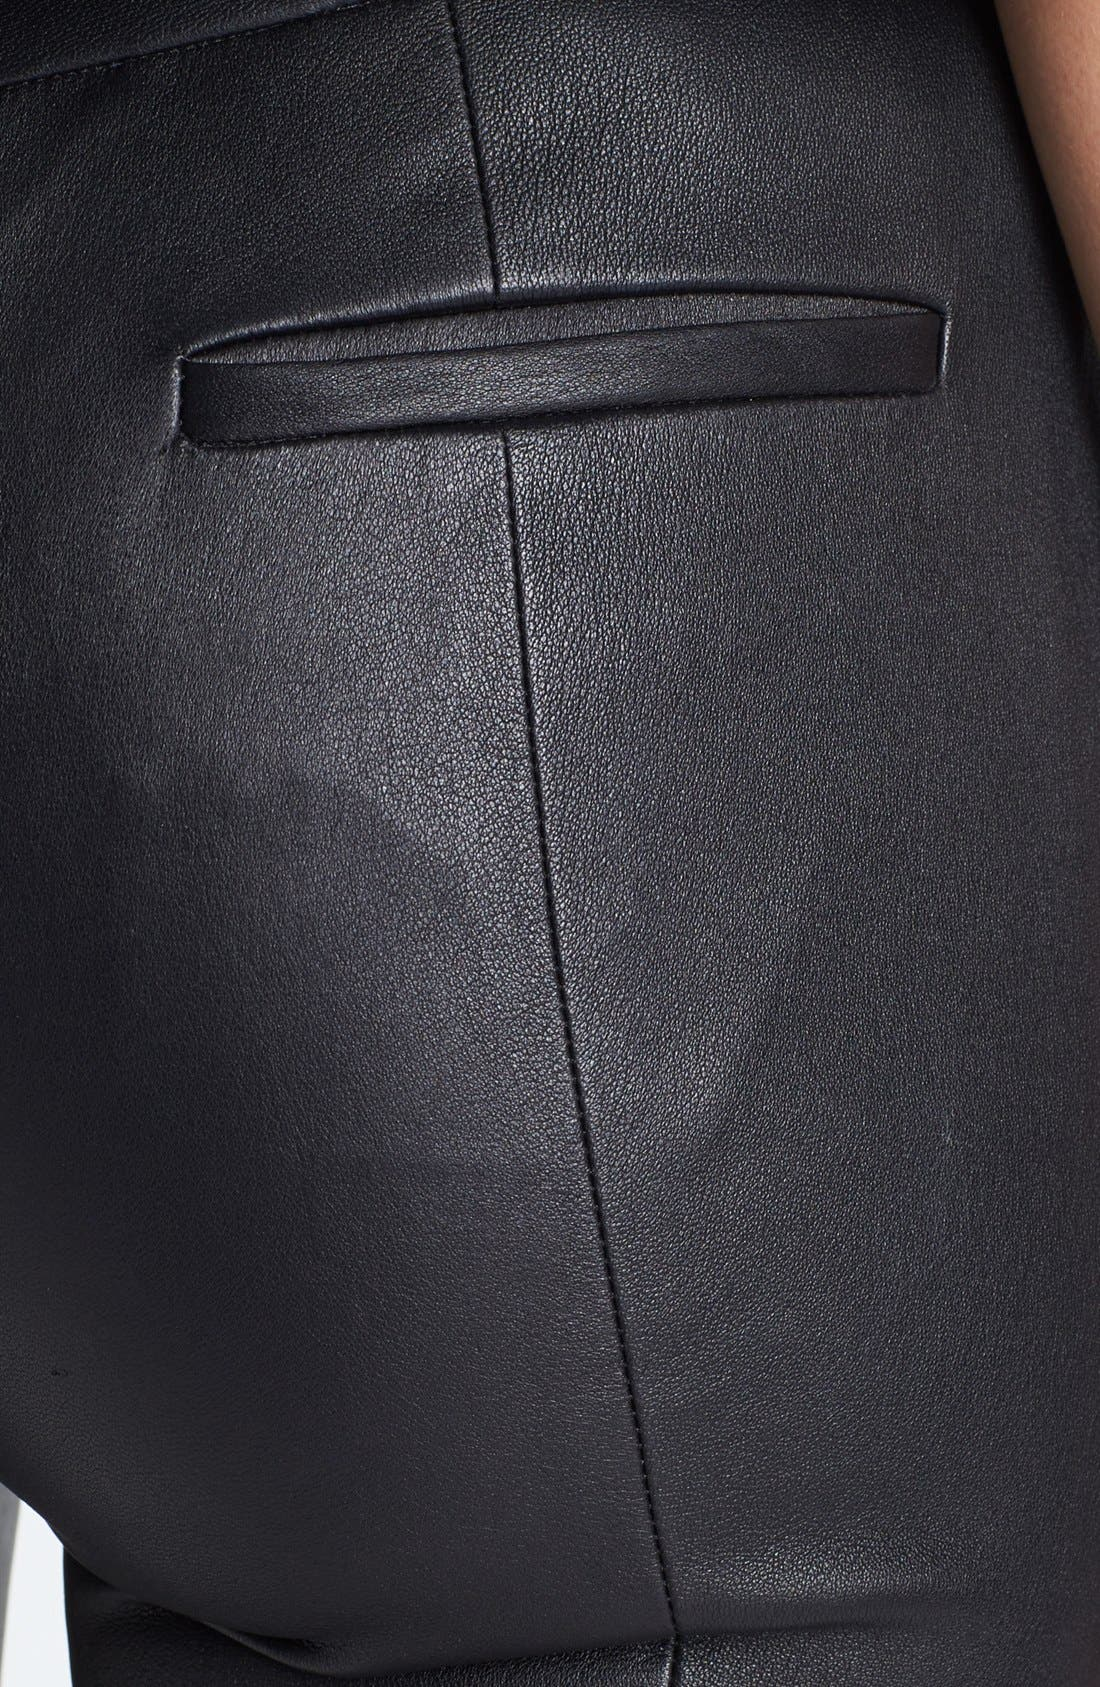 Alternate Image 3  - Diane von Furstenberg 'Dorthia' Mikado & Leather Pants